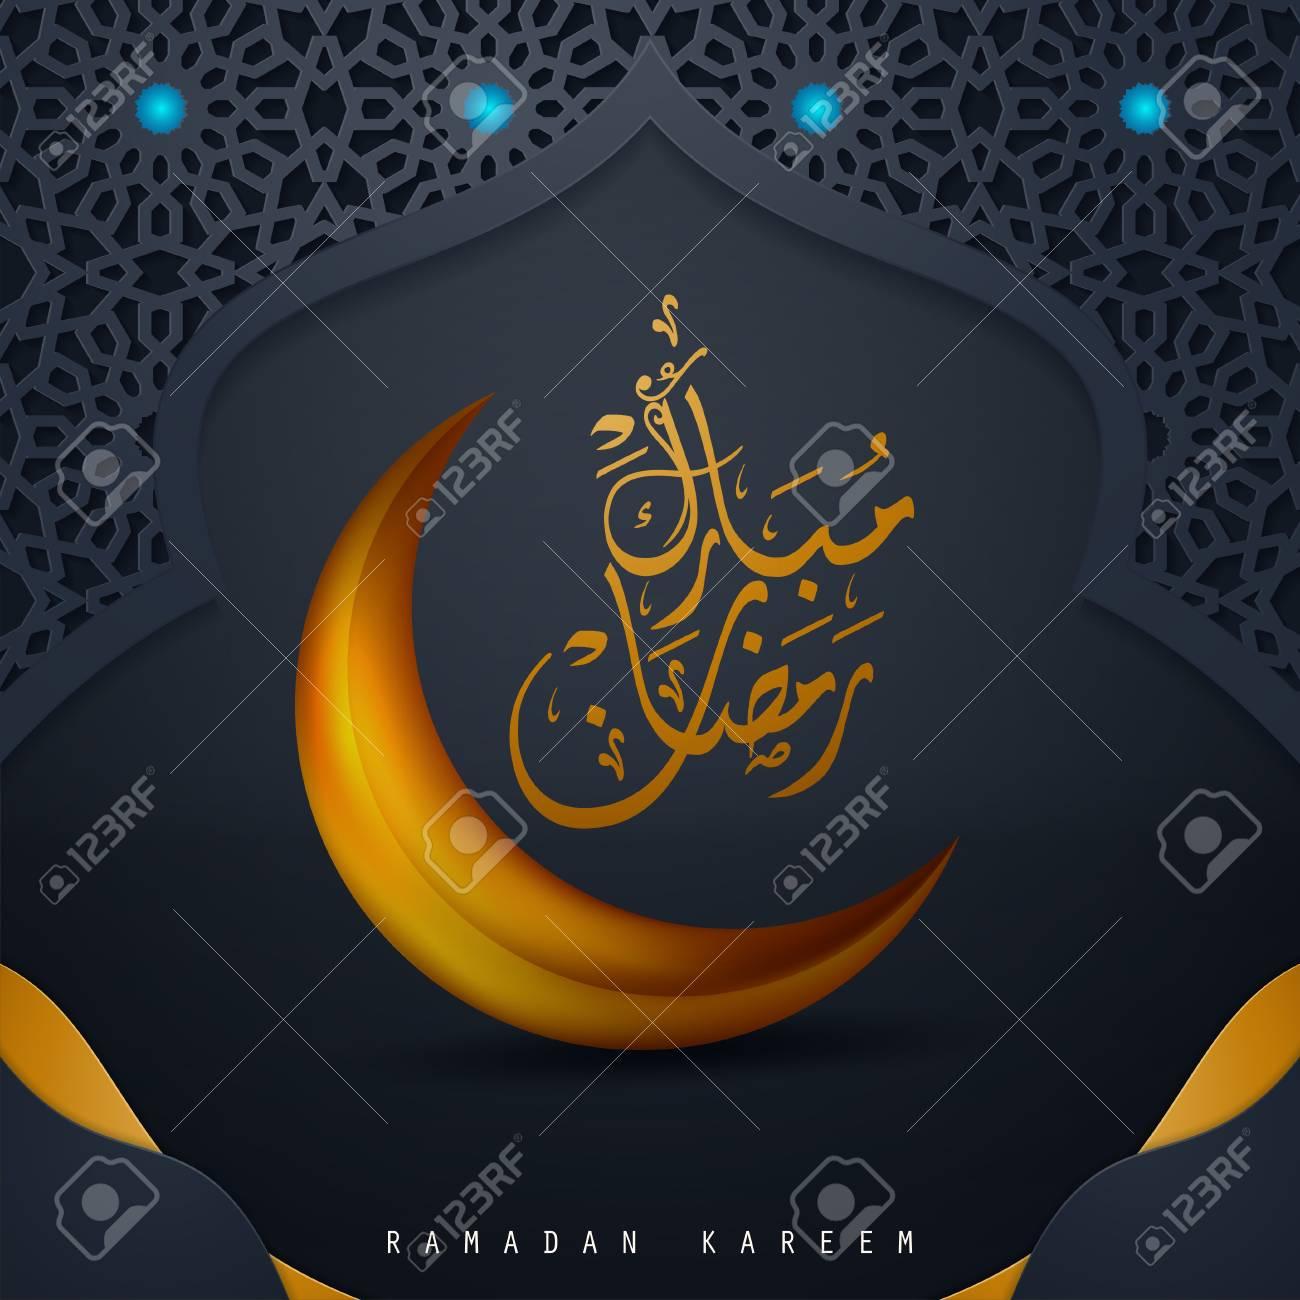 Ramadan Kareem arabic islamic greeting design with islamic crescent